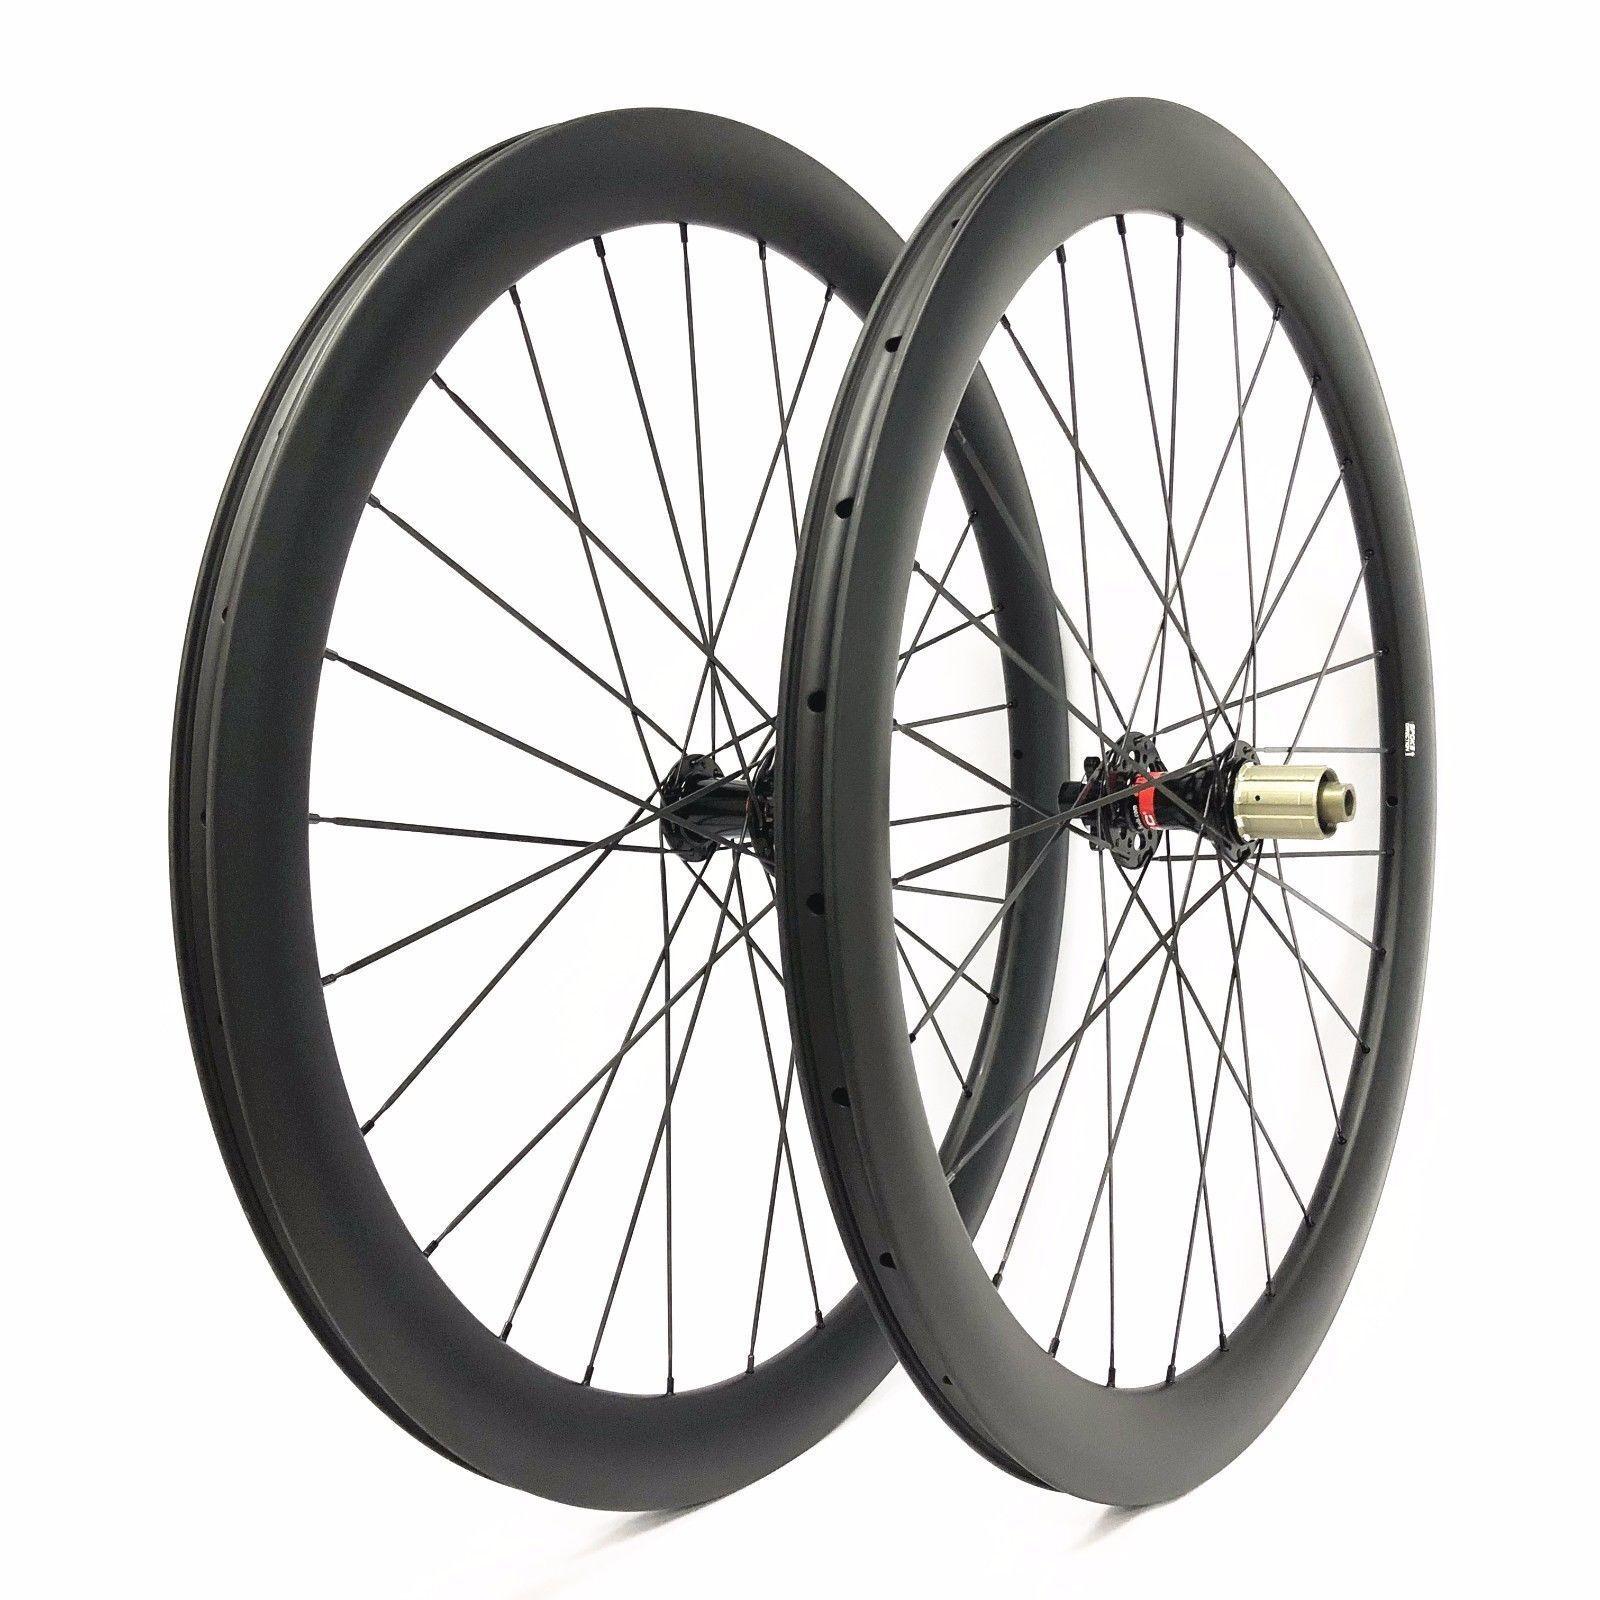 29 inch Carbon Cyclocross Wheelset 47mm Depth 28mm width disc brake Hub Wheels